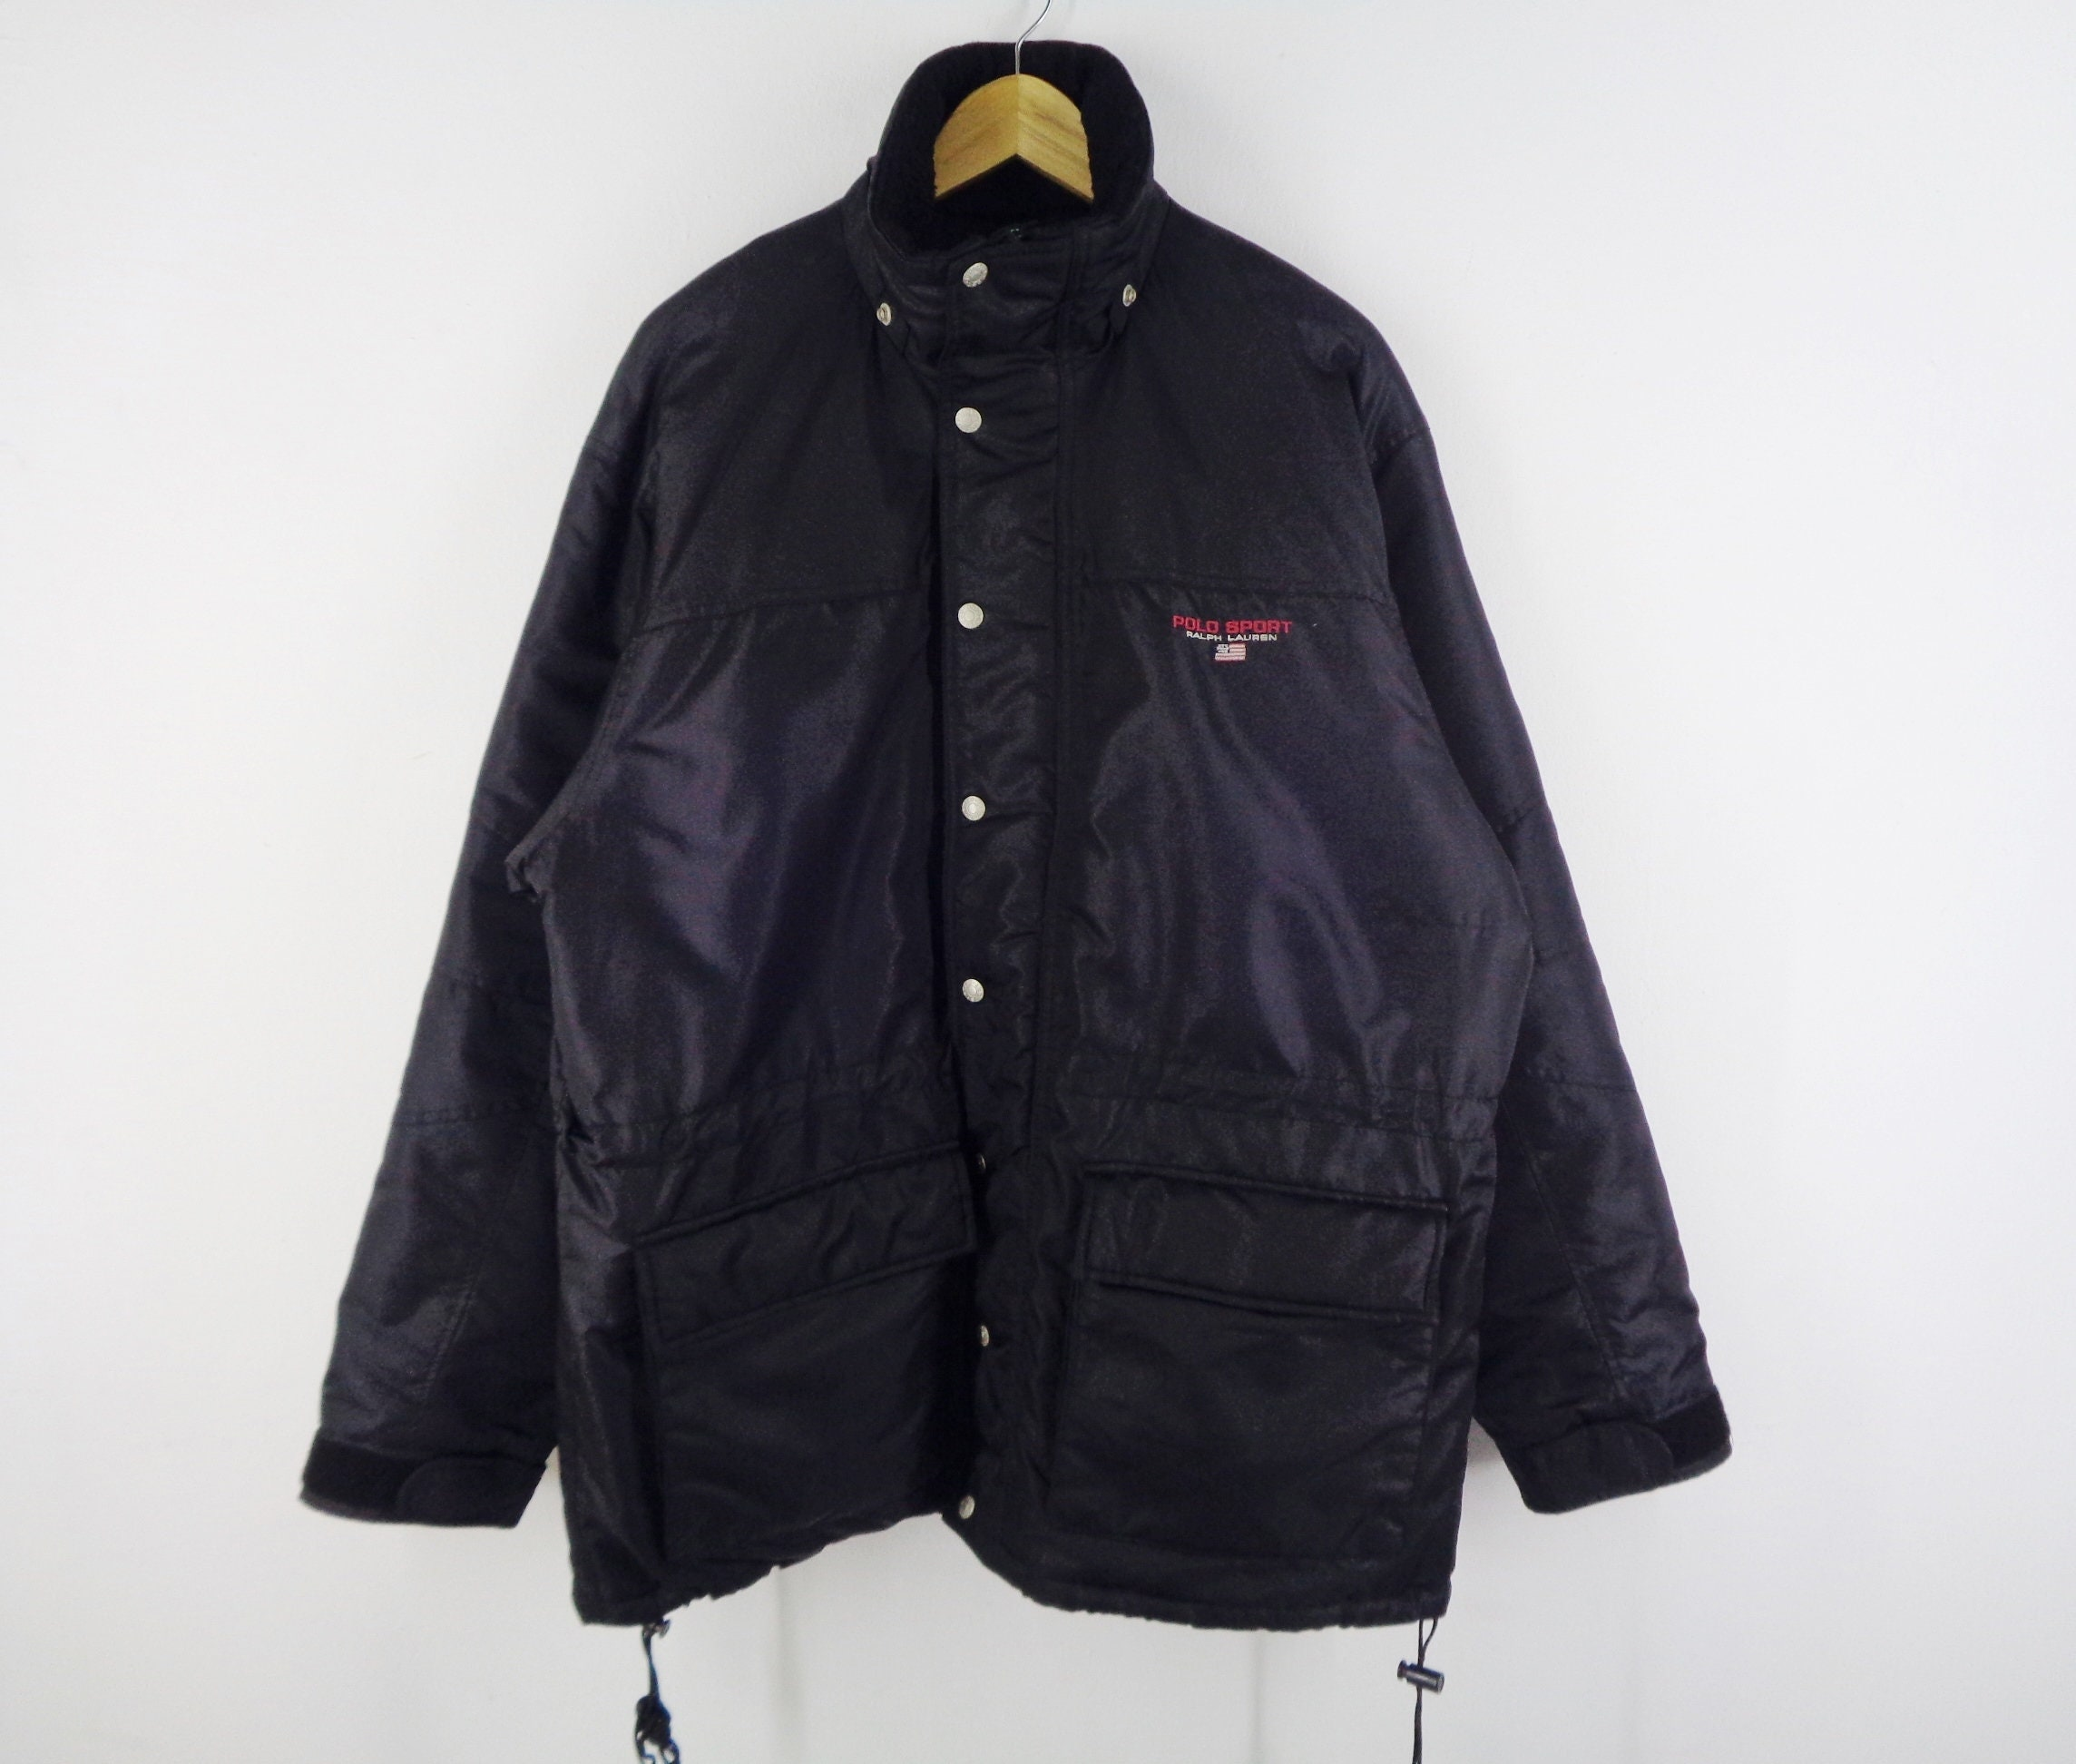 77caf890 Polo Sport Jacket Vintage Polo Sport Ralph Lauren Windbreaker Vintage Polo  Sport Ralph Lauren Winter Jacket Mens Size M